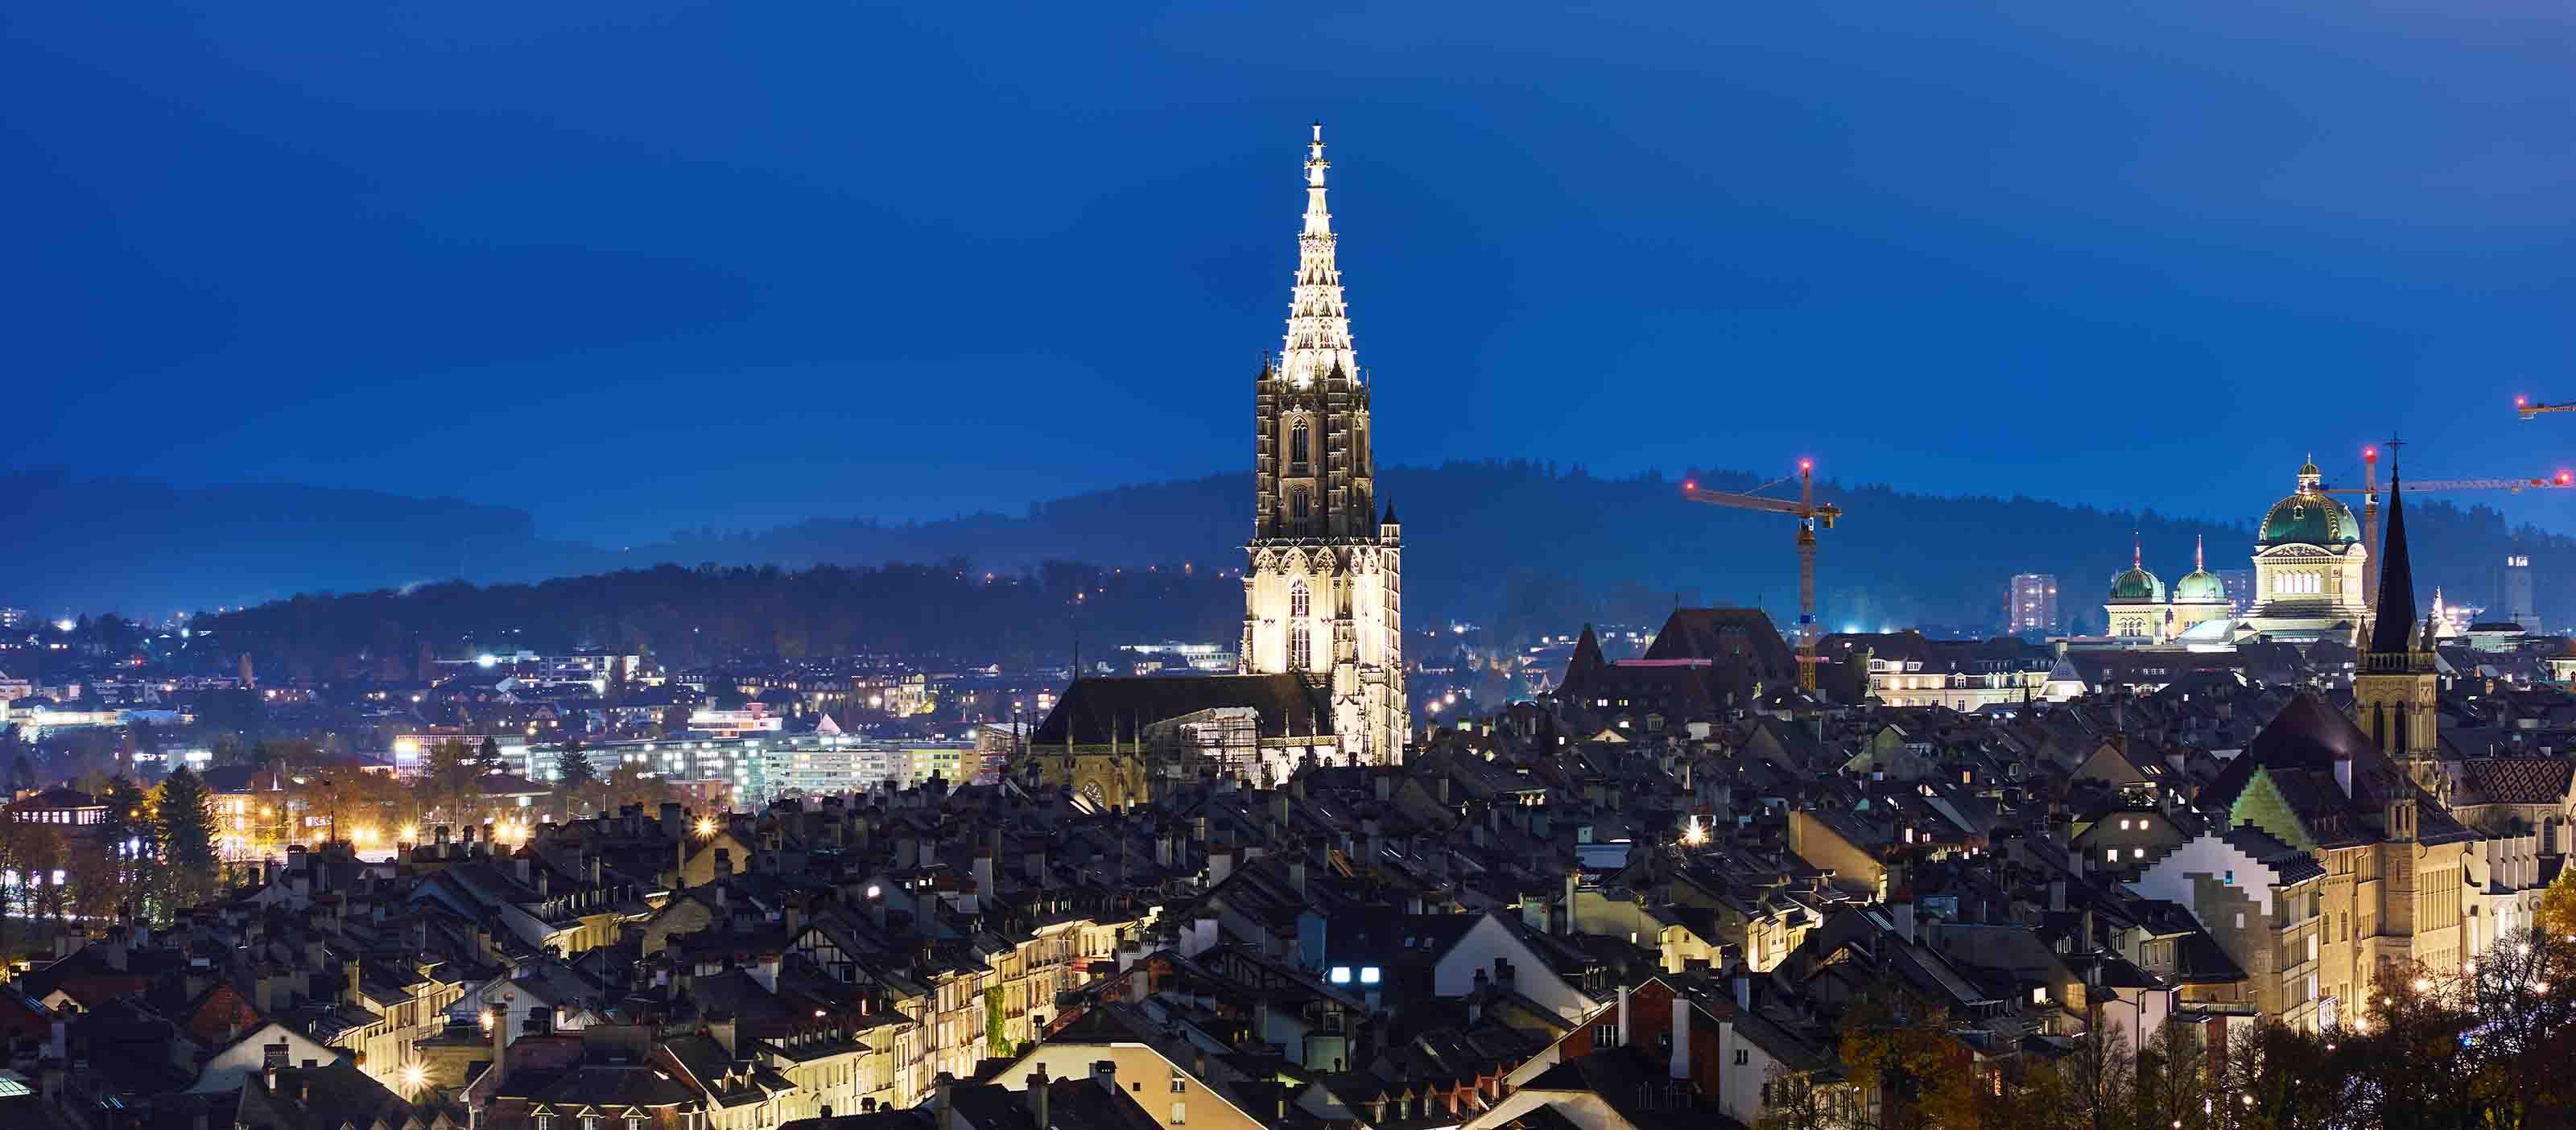 GE Digital helps Swisscom meet the growing need for telecom bandwidth in Switzerland